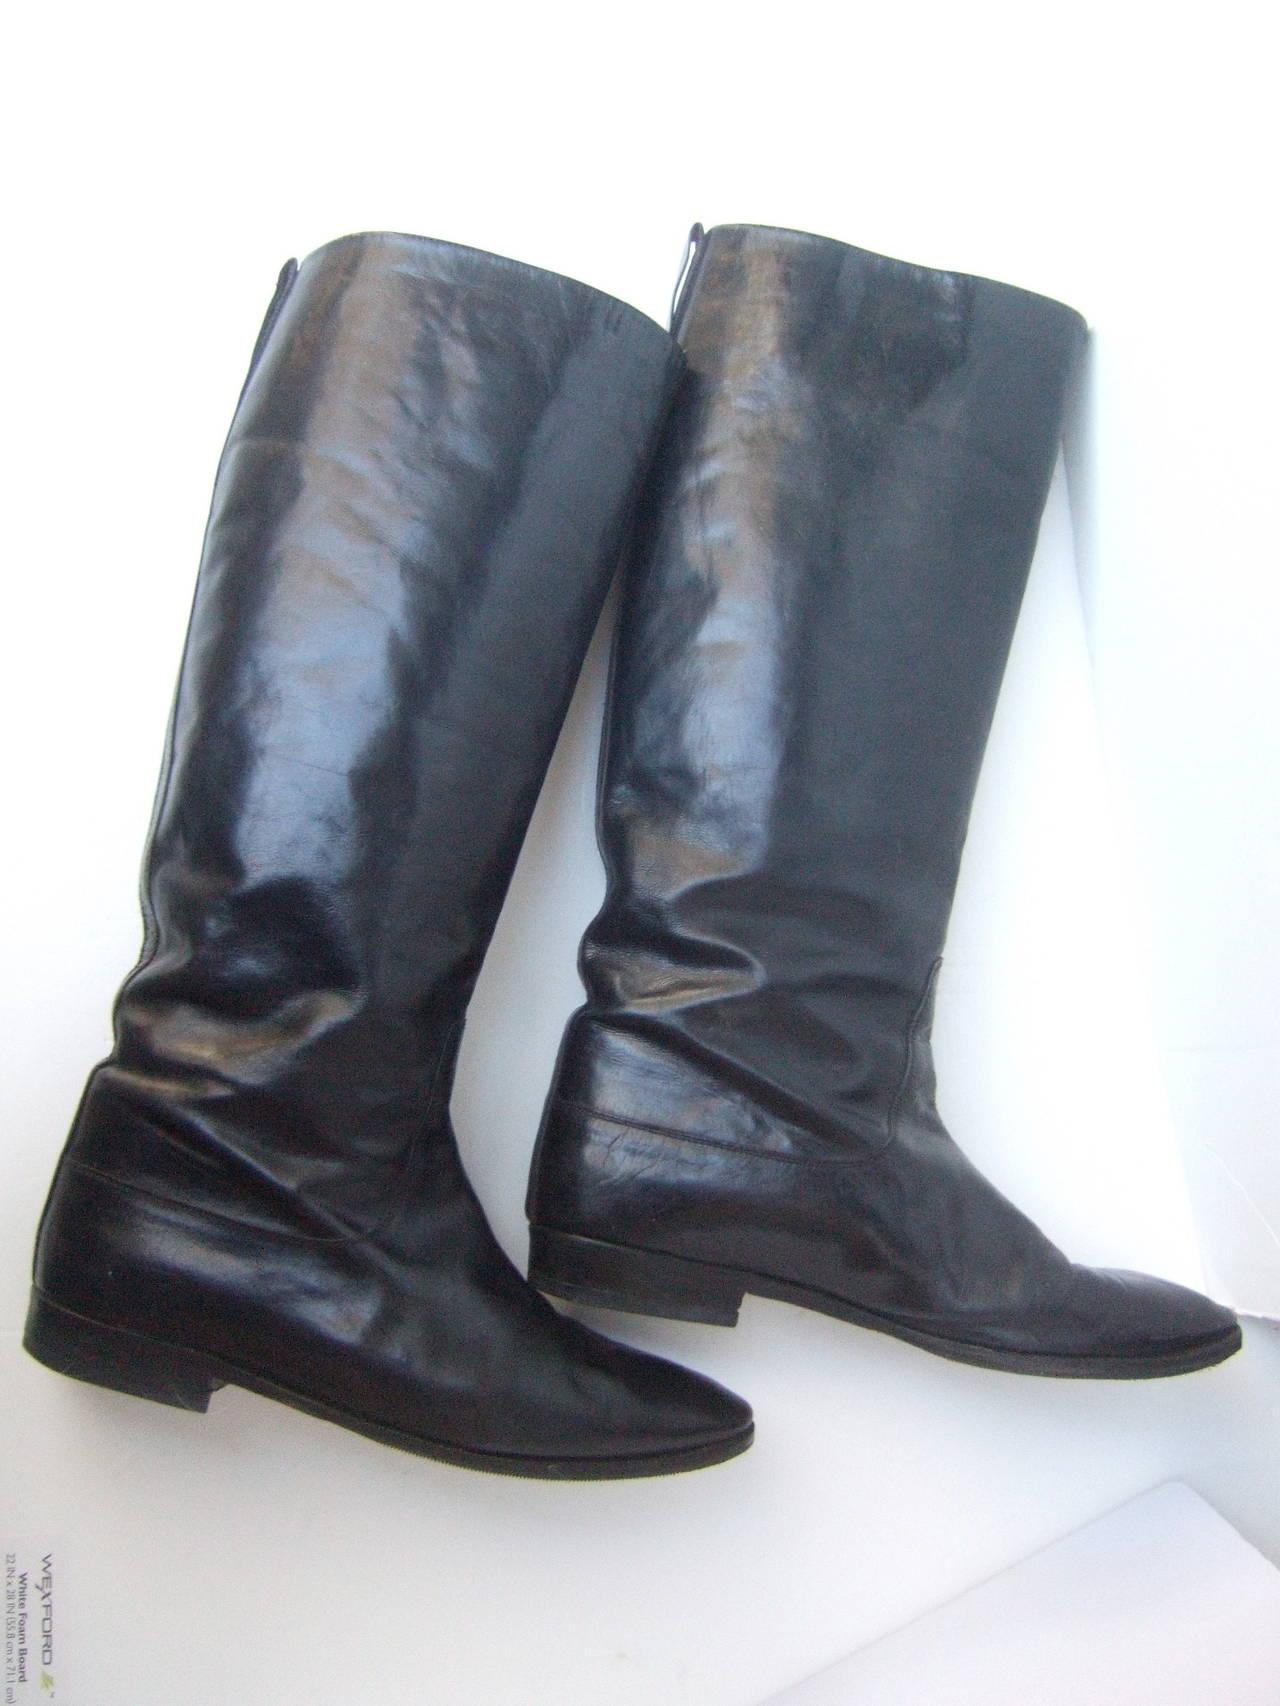 Gucci Black Leather Vintage Riding Boots C 1980s Size 38 5